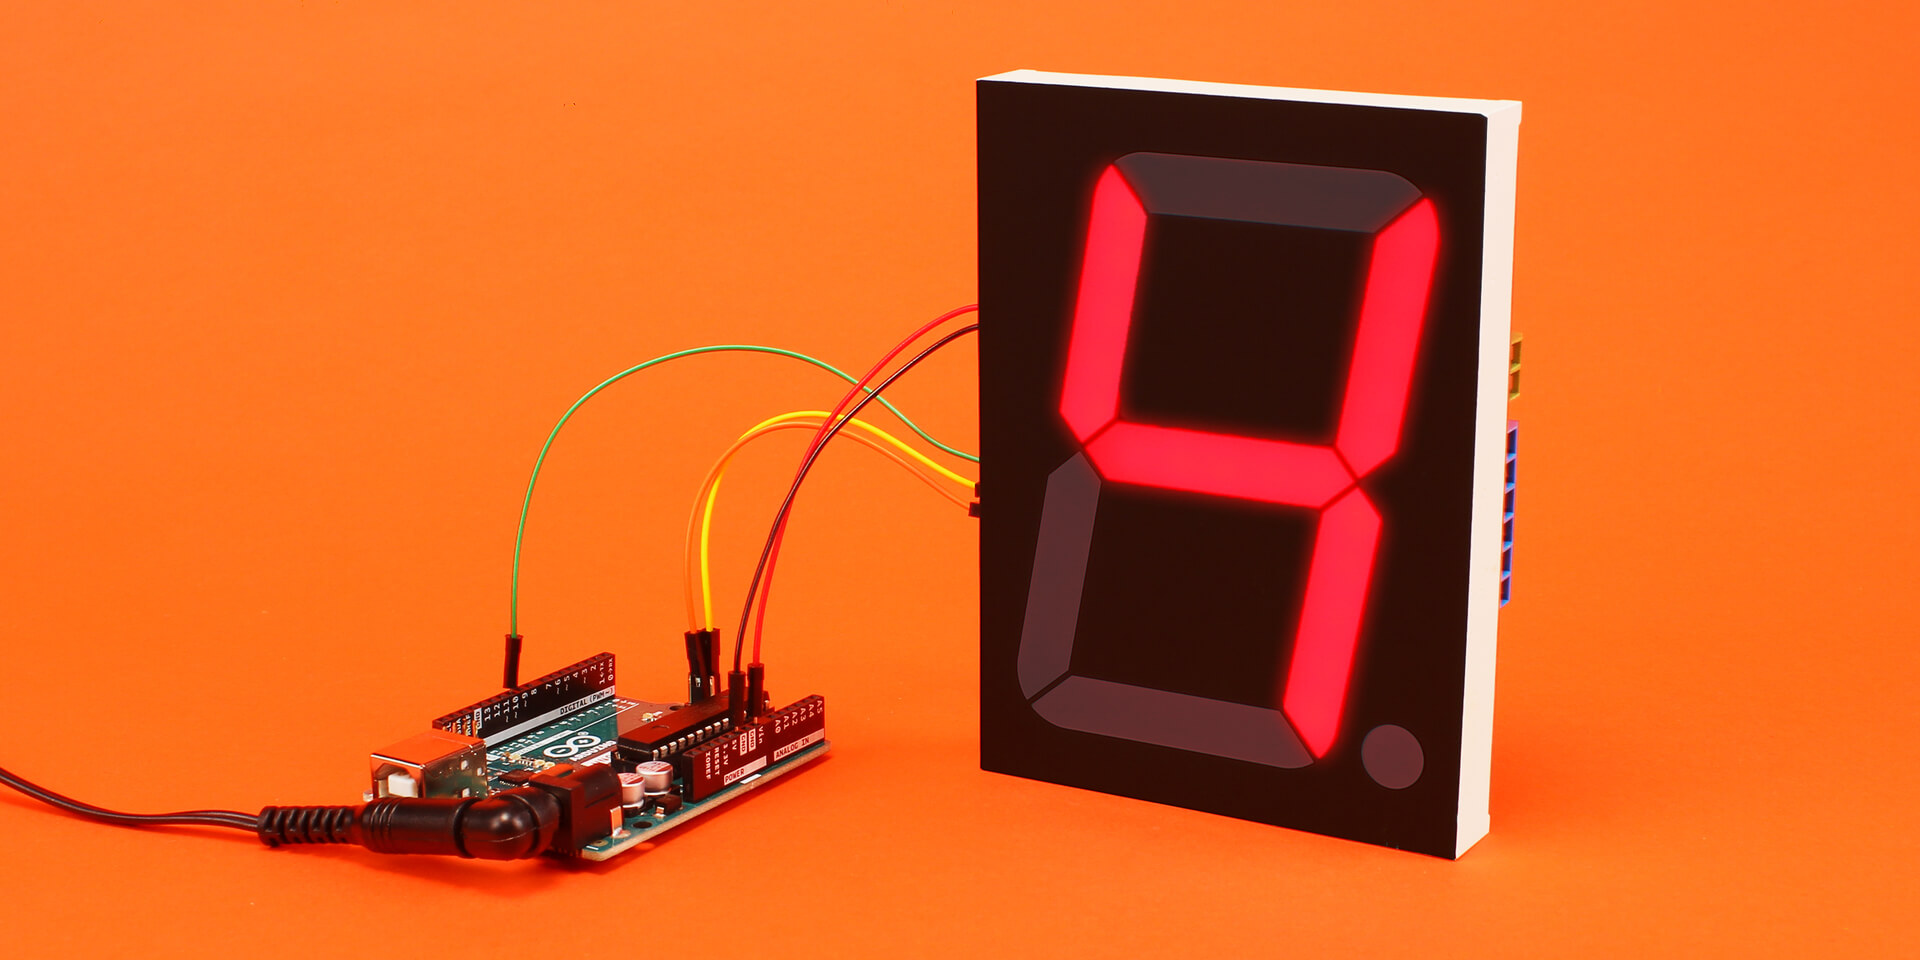 Segm8 with Arduino